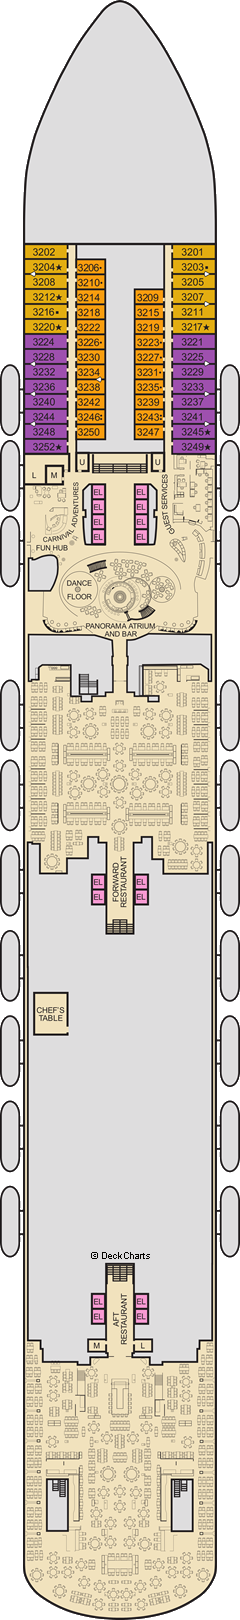 Carnival Panorama : Lobby Deck